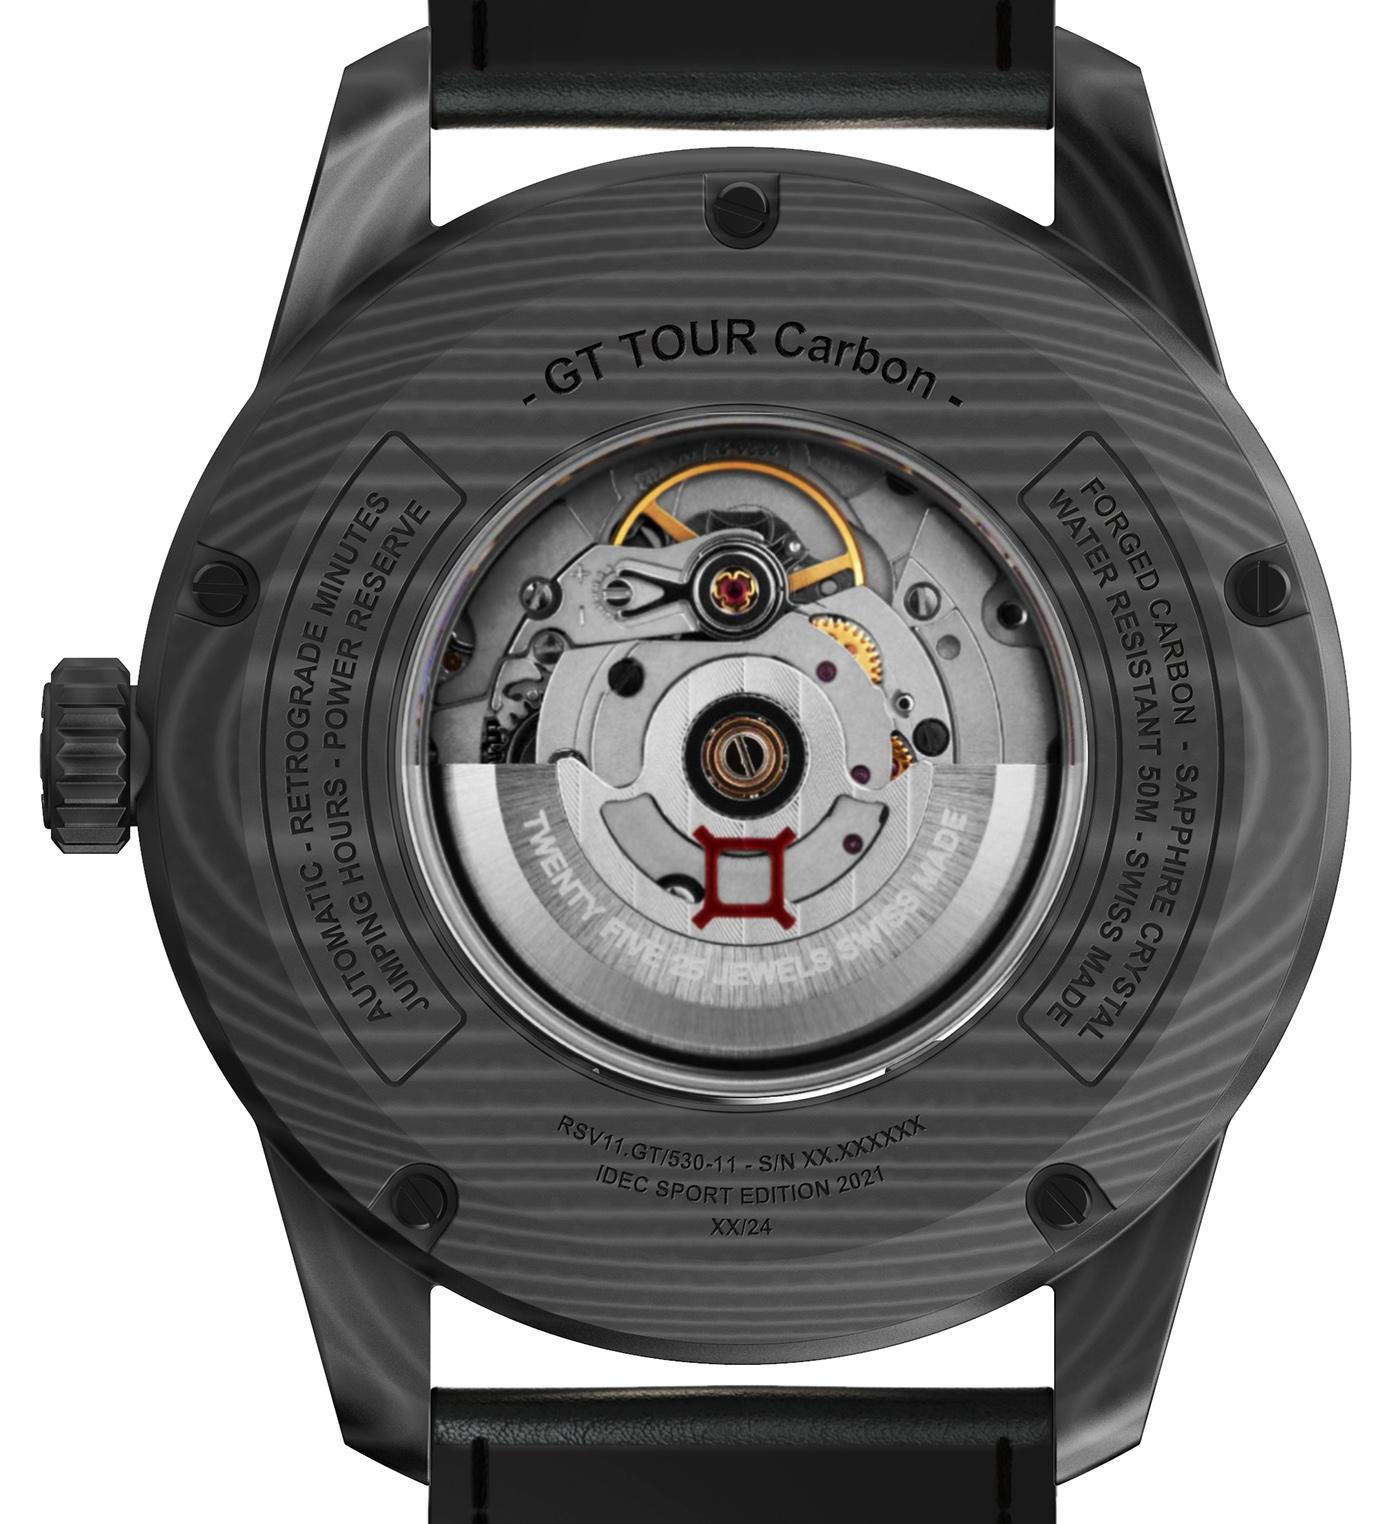 Часы в стиле гонки: Reservoir Debuts Limited GT Tour Carbon IDEC Sport Edition 2021